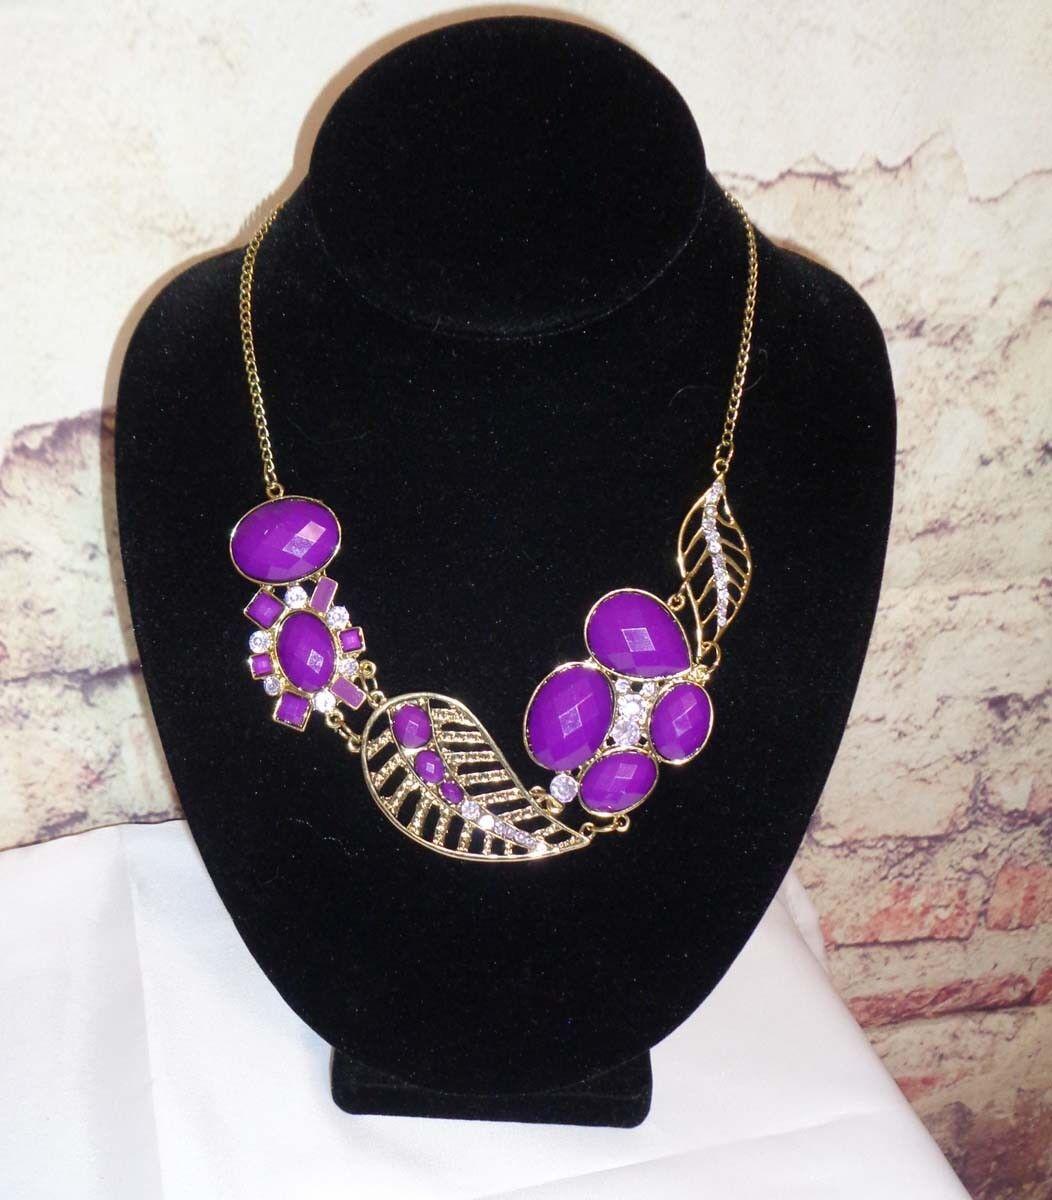 Necklace Gold Finish Purple Leaf Design Very Classy